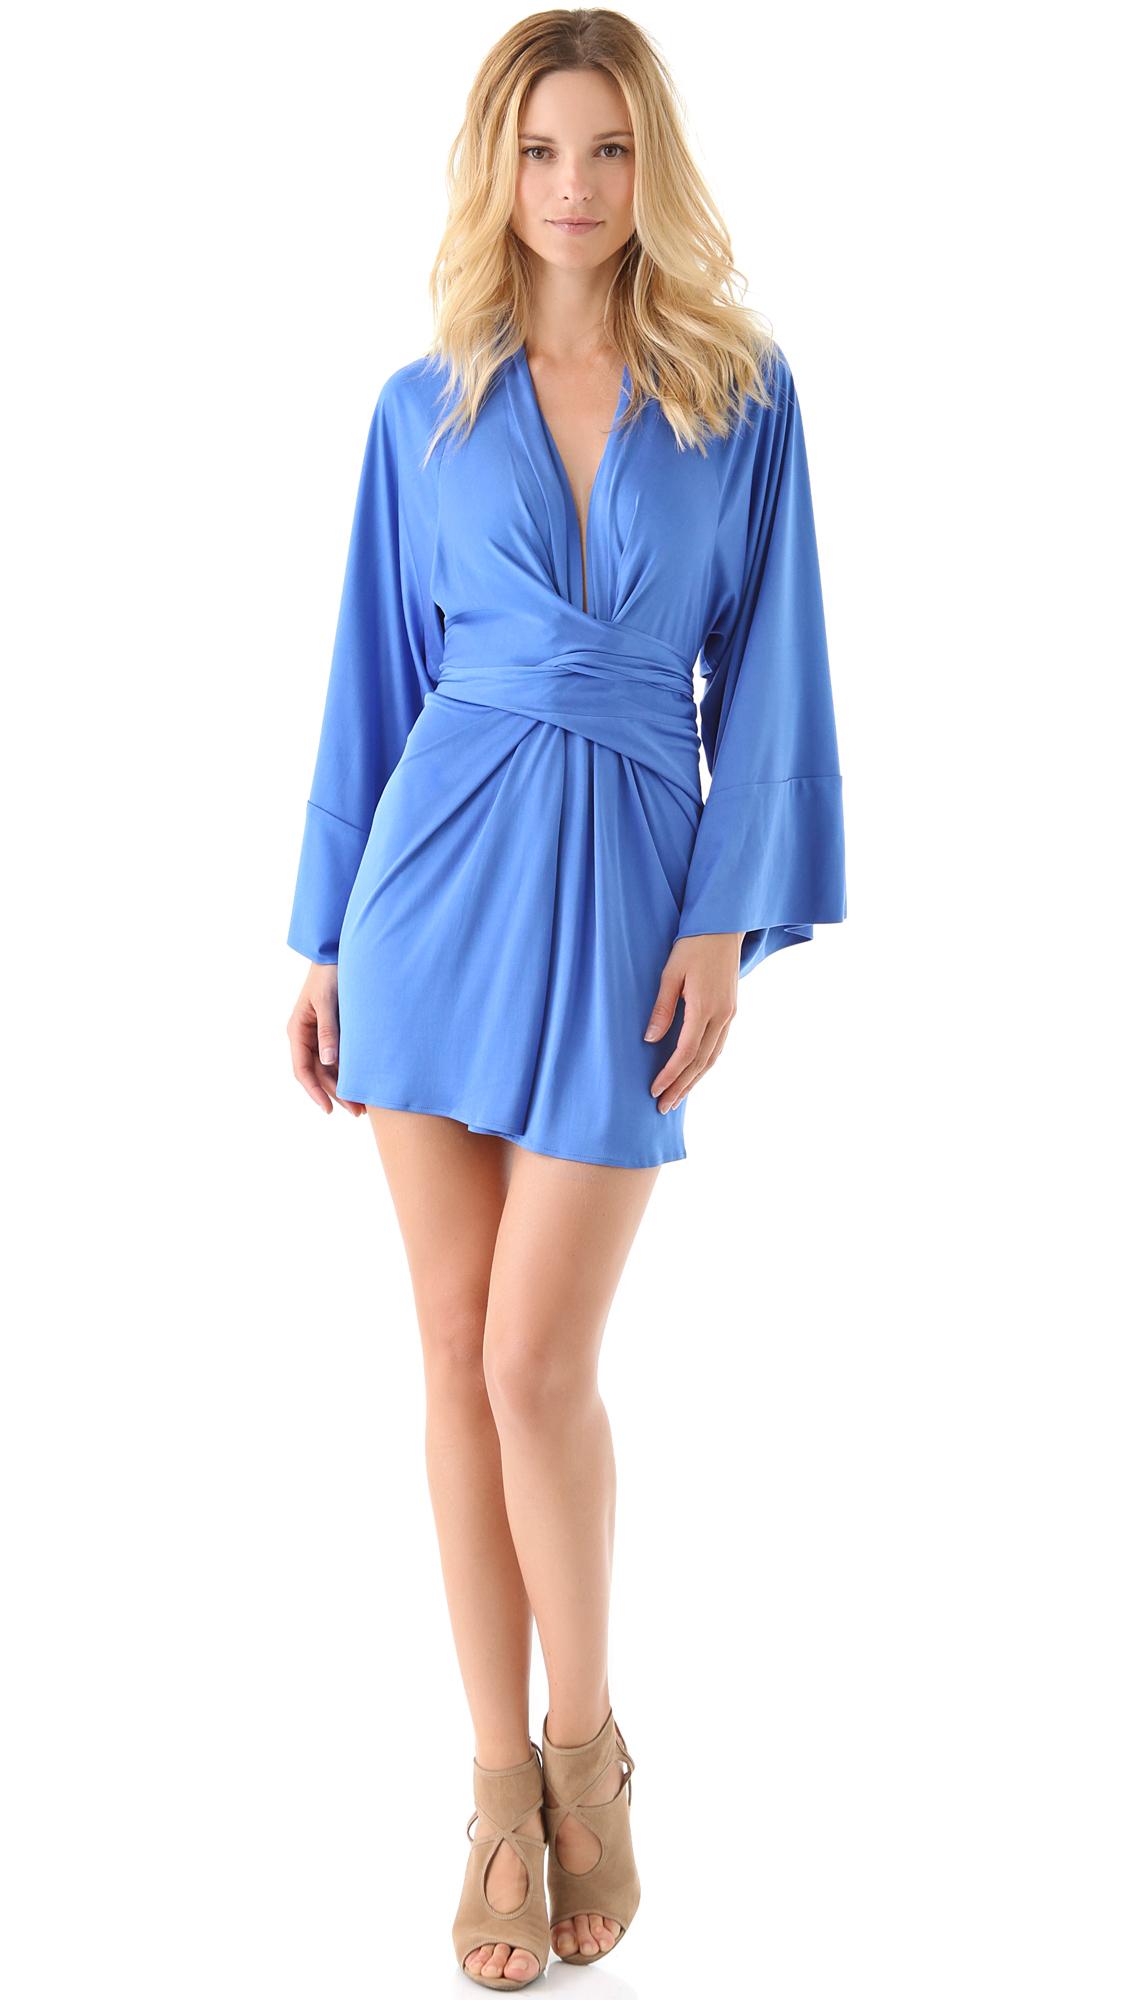 DRESSES - Short dresses Issa oh2Y6gbBw